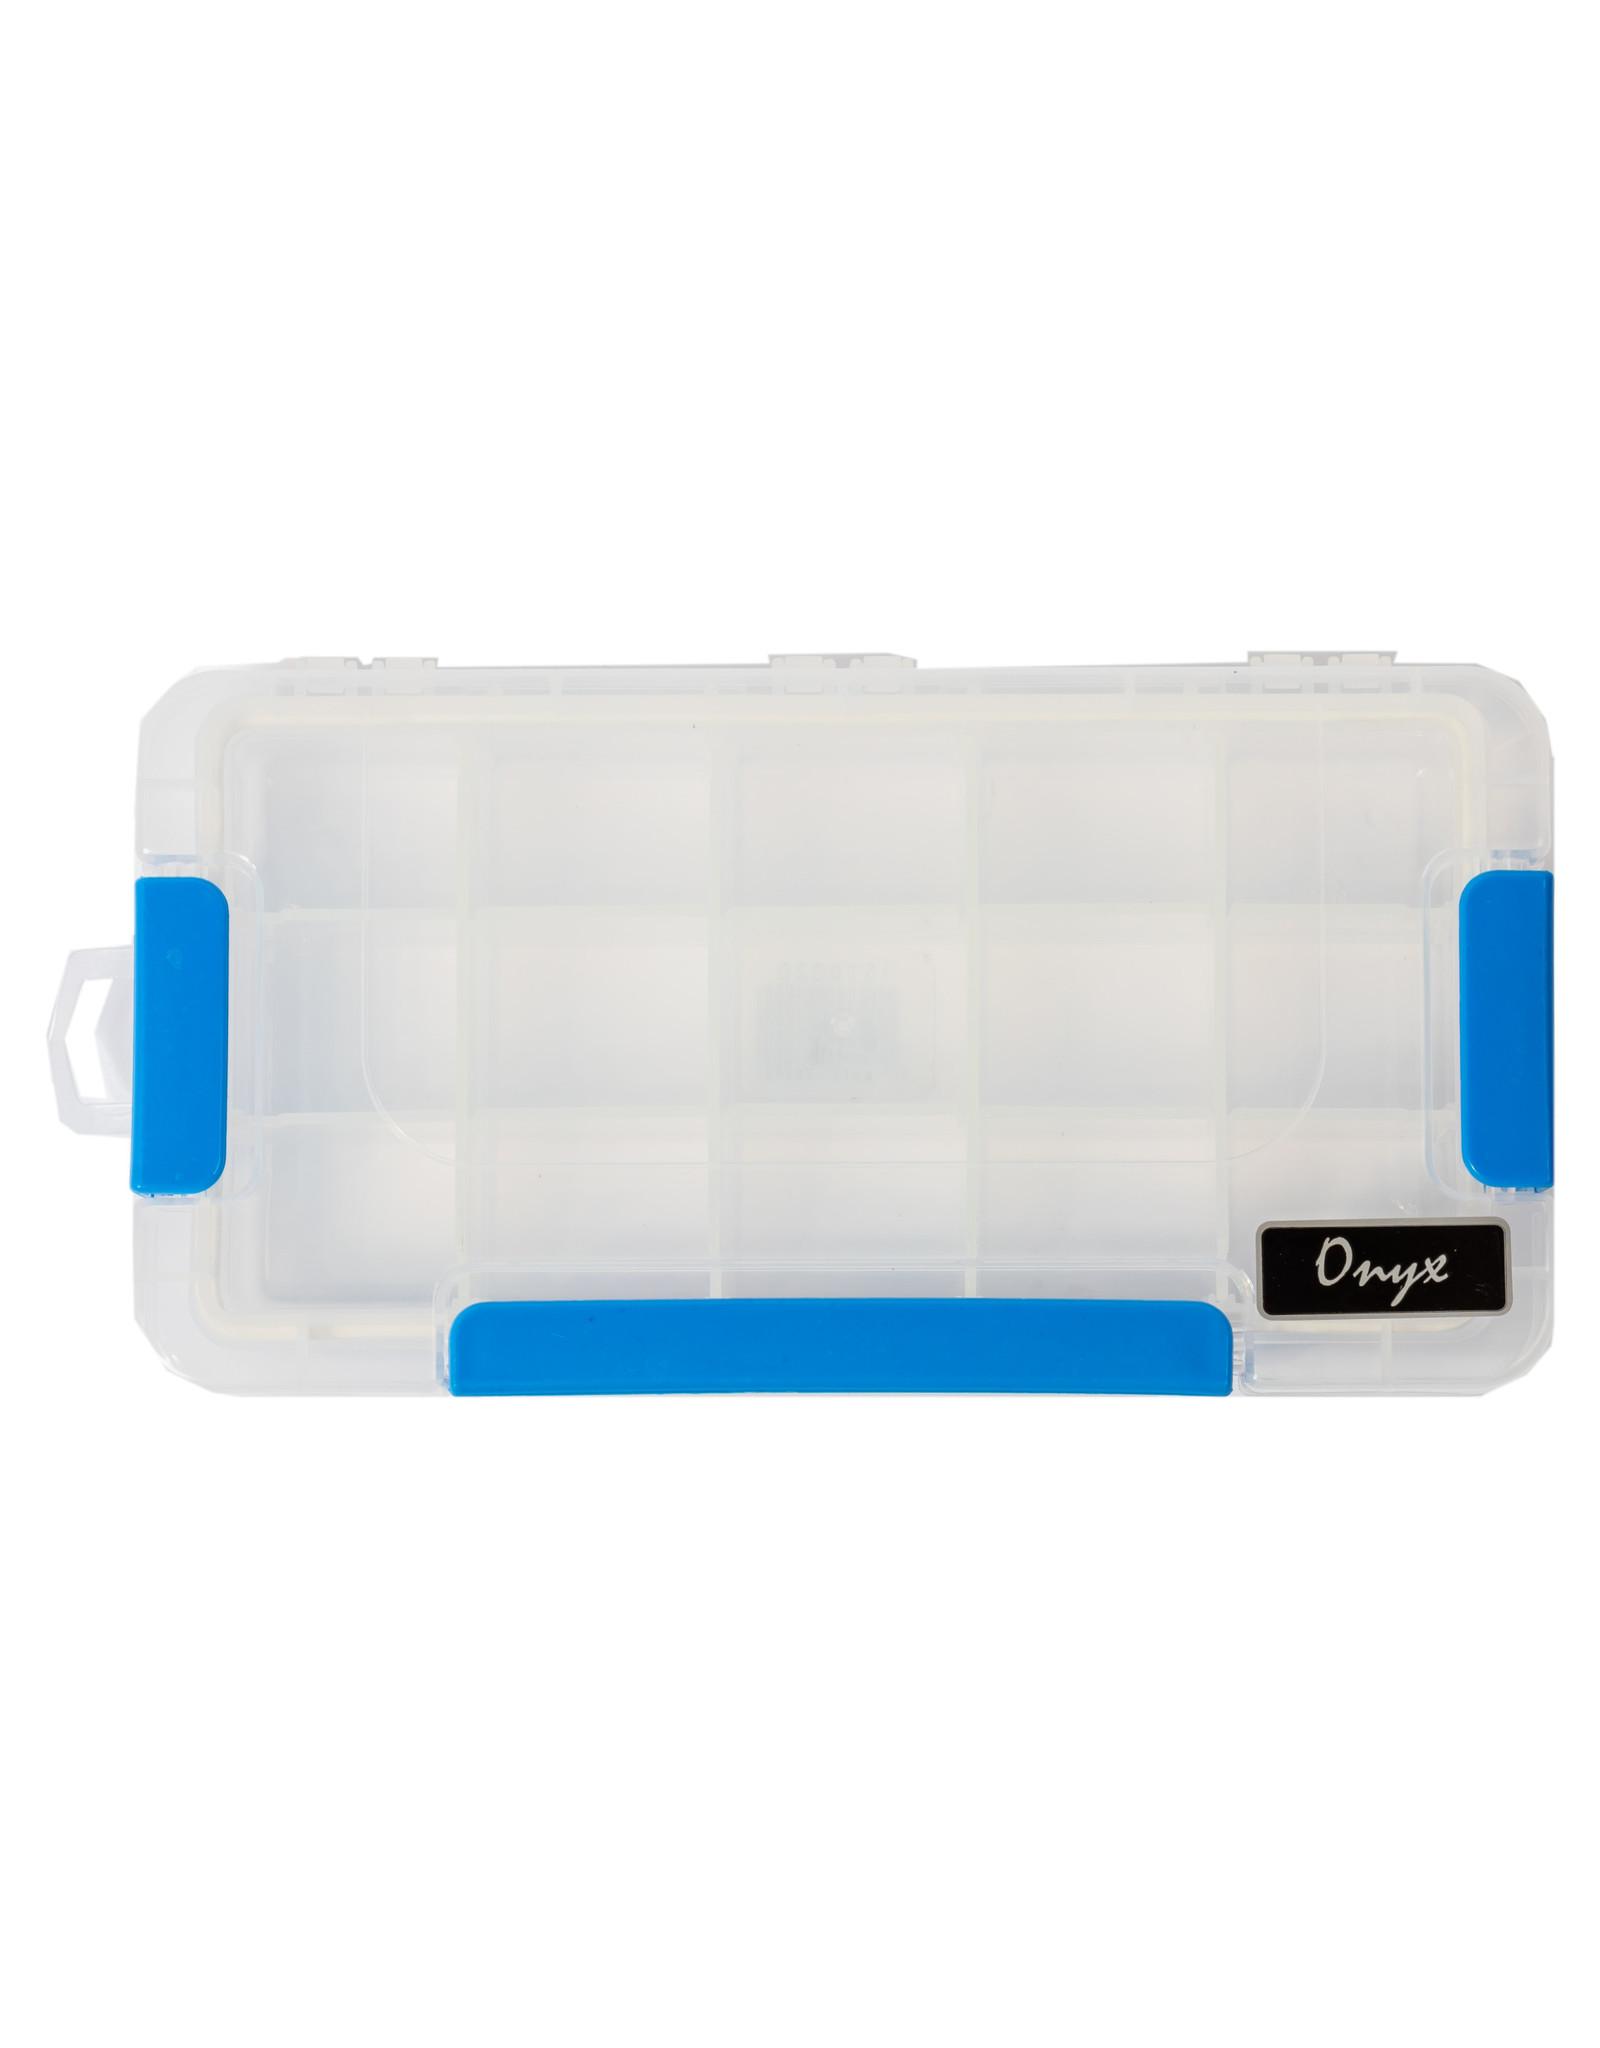 LION Onyx Tackle Box S